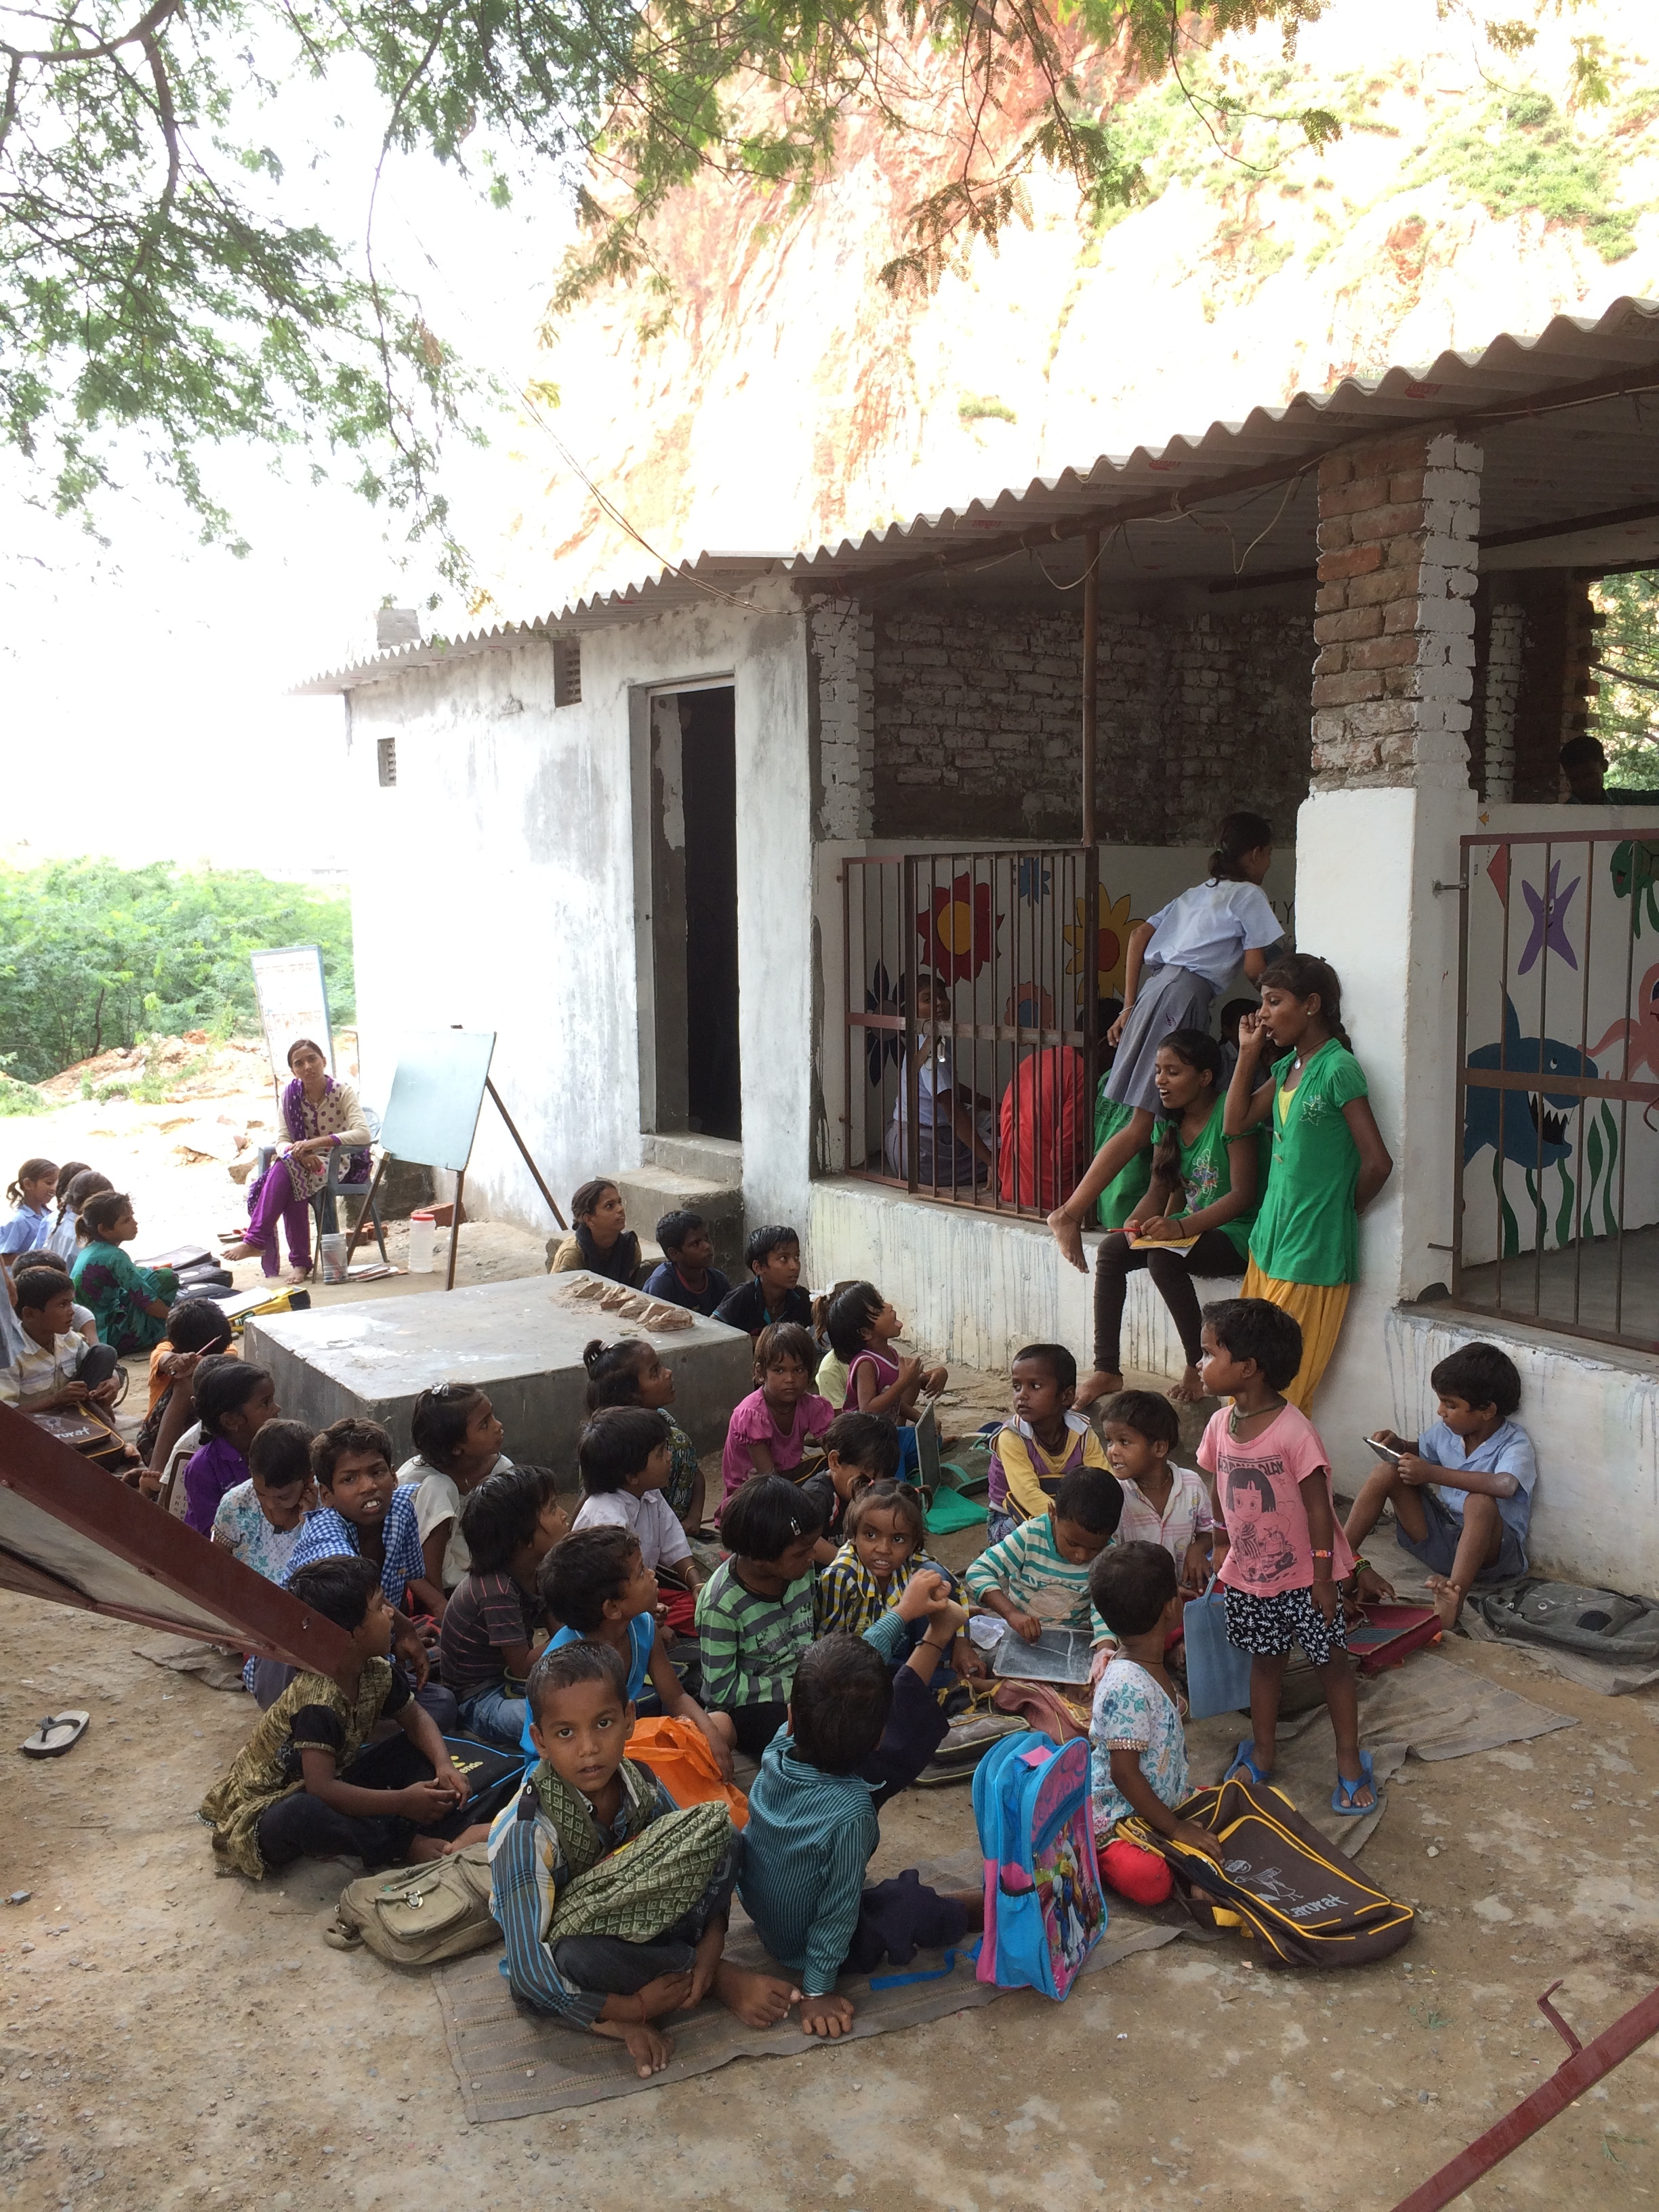 Outdoor school classroom in Jaipur, India